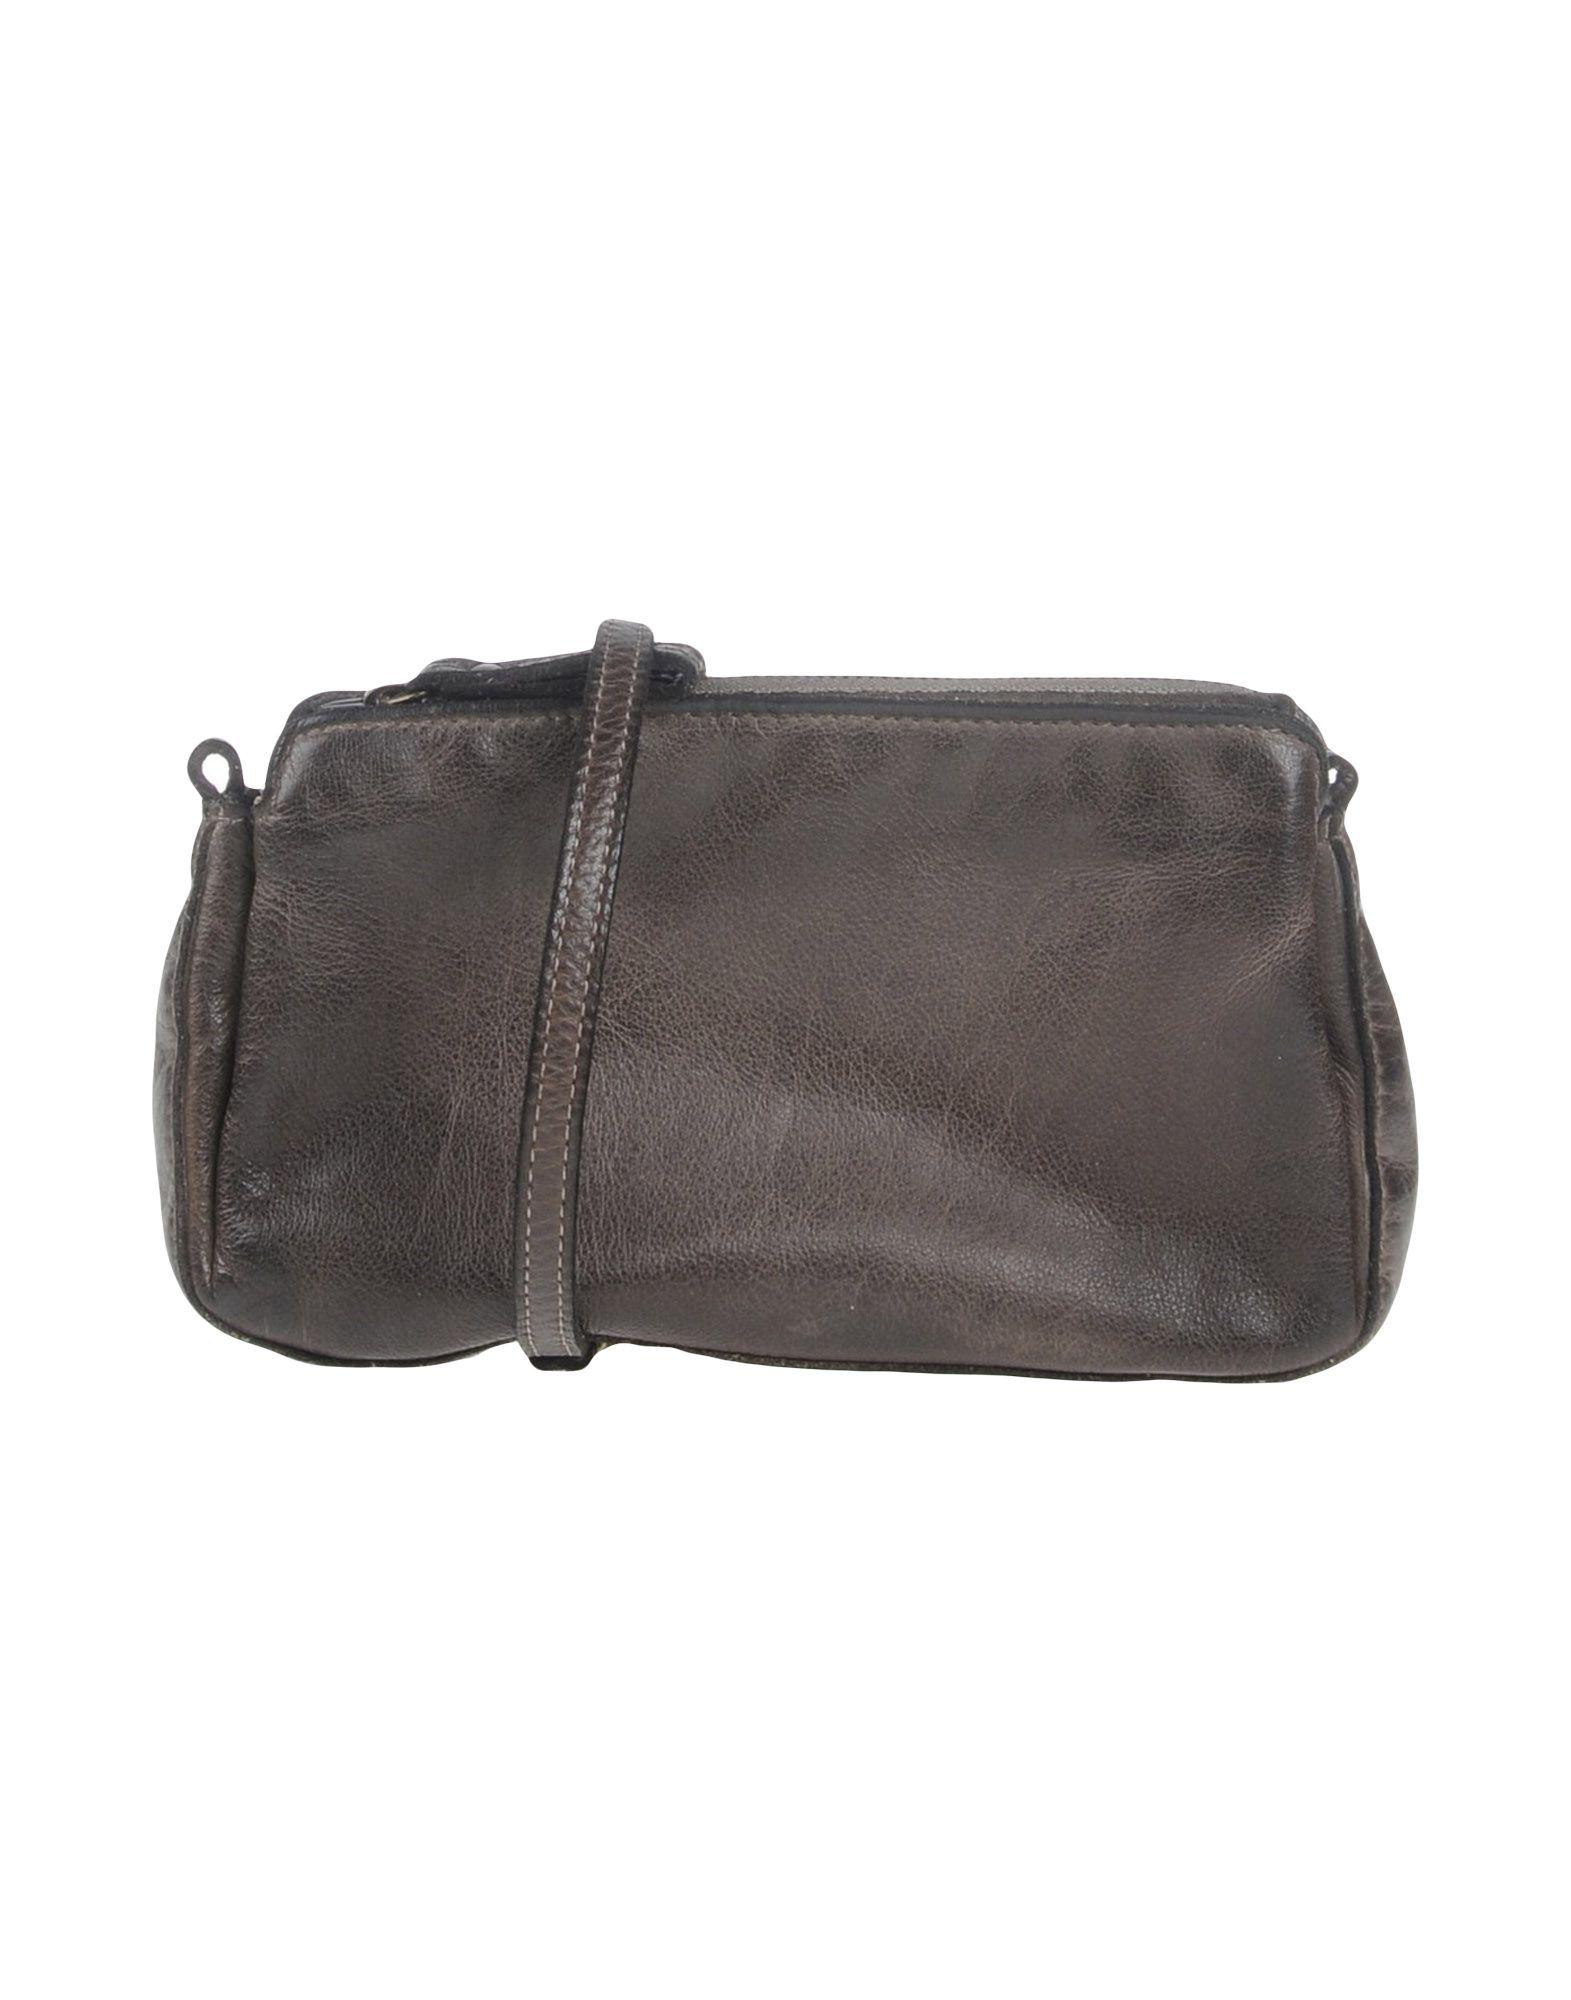 CORSIA Damen Handtaschen Farbe Dunkelbraun Größe 1